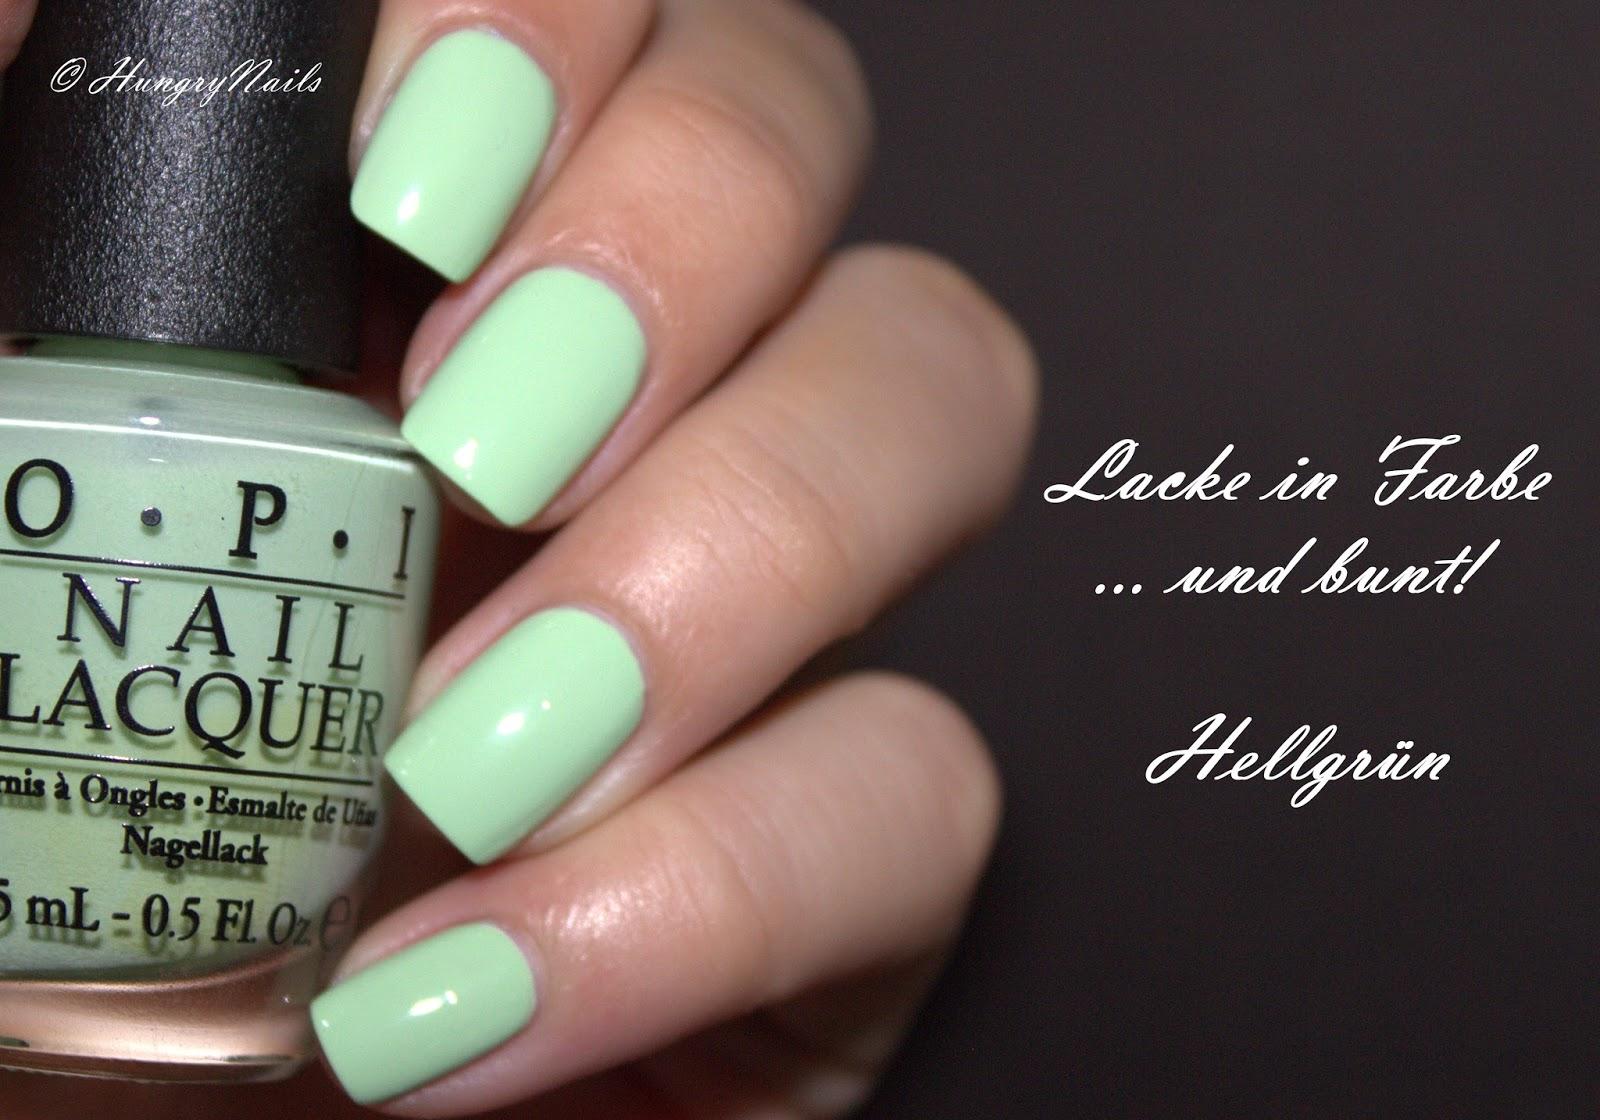 Lacke in Farbe und bunt   Hellgrün - HungryNails Blog   Die bunte ...